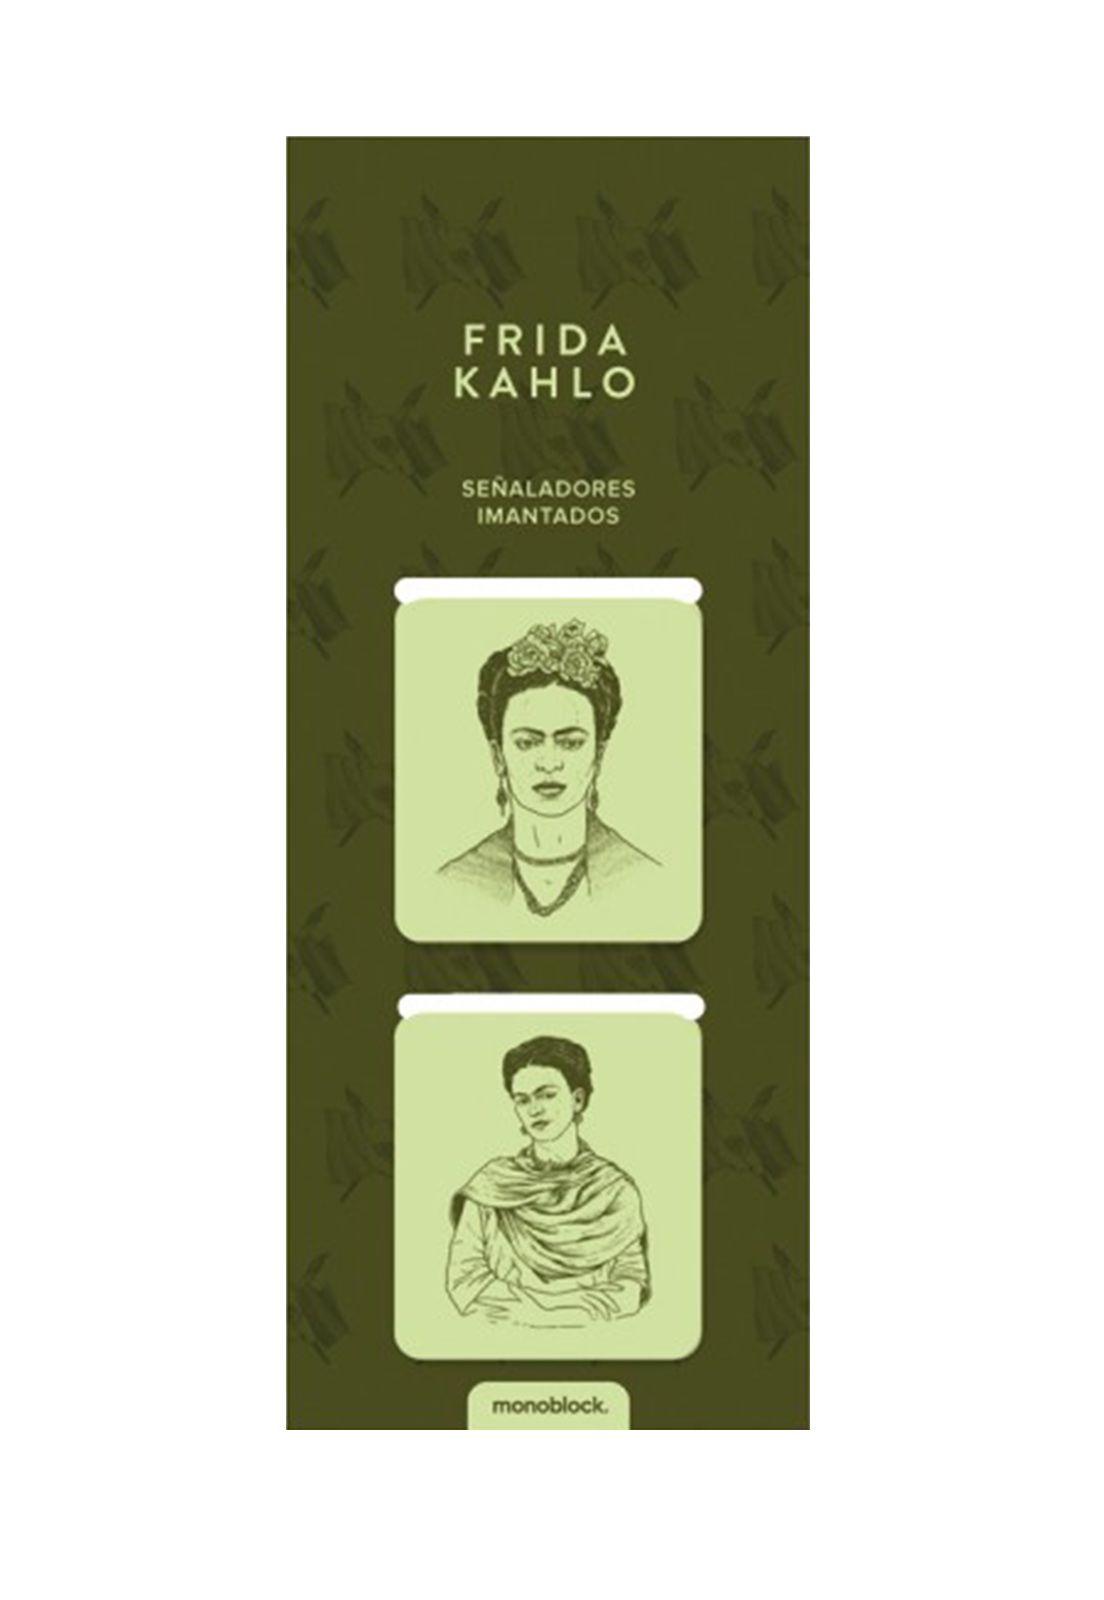 Señalador Imantado Frida